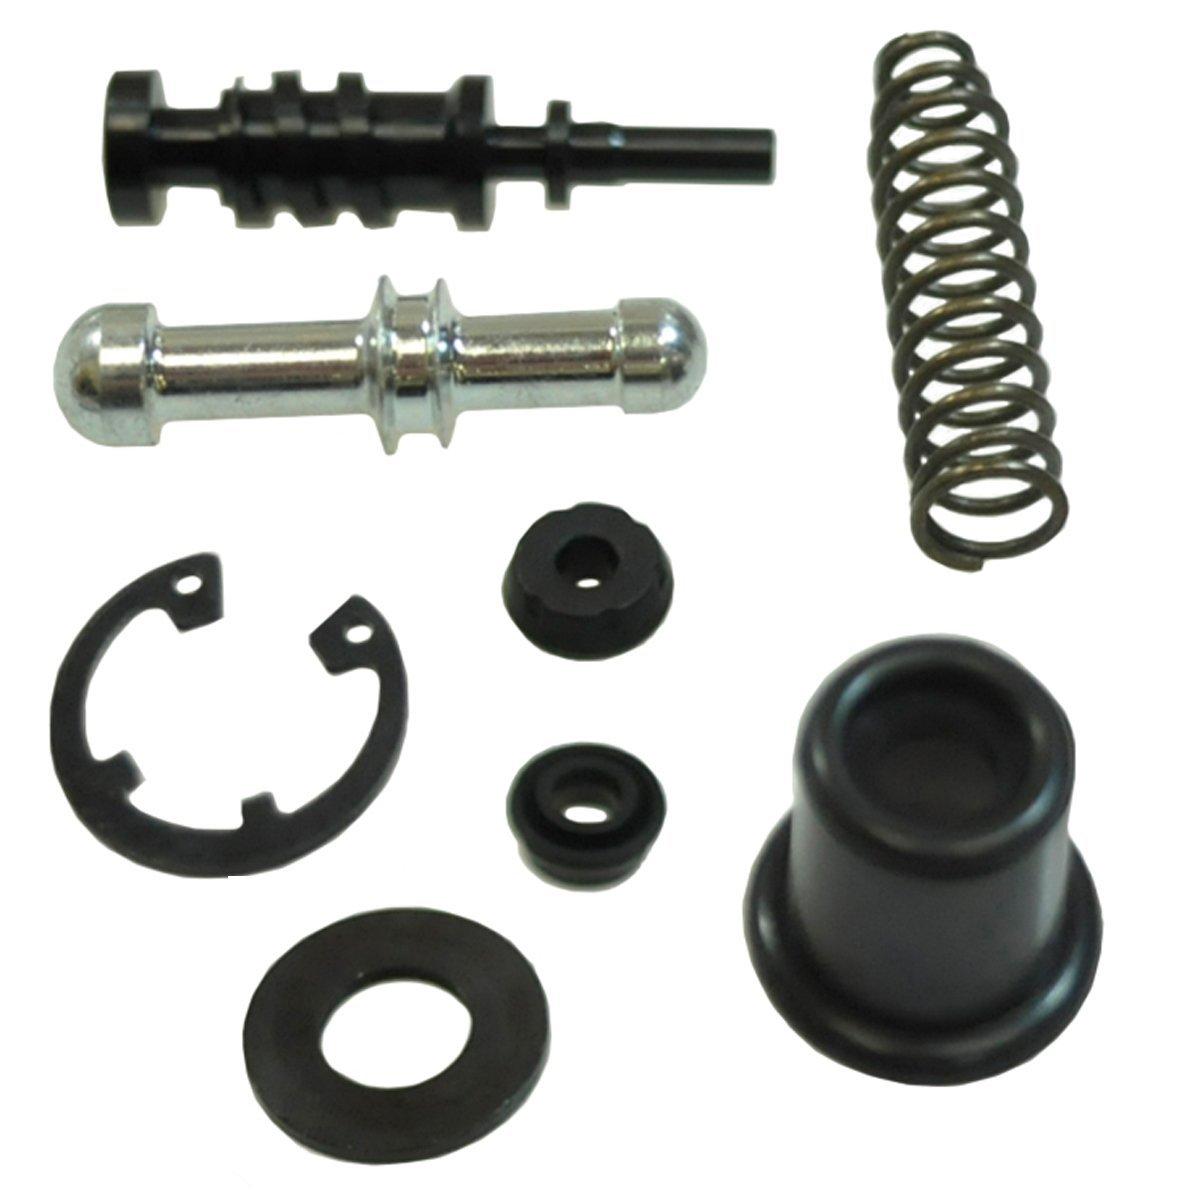 Fuel Tank Gas Cap Cover Plug For Yamaha YZ426F YFZ450 YFZ450R YZ250 YZ125 YFZ450